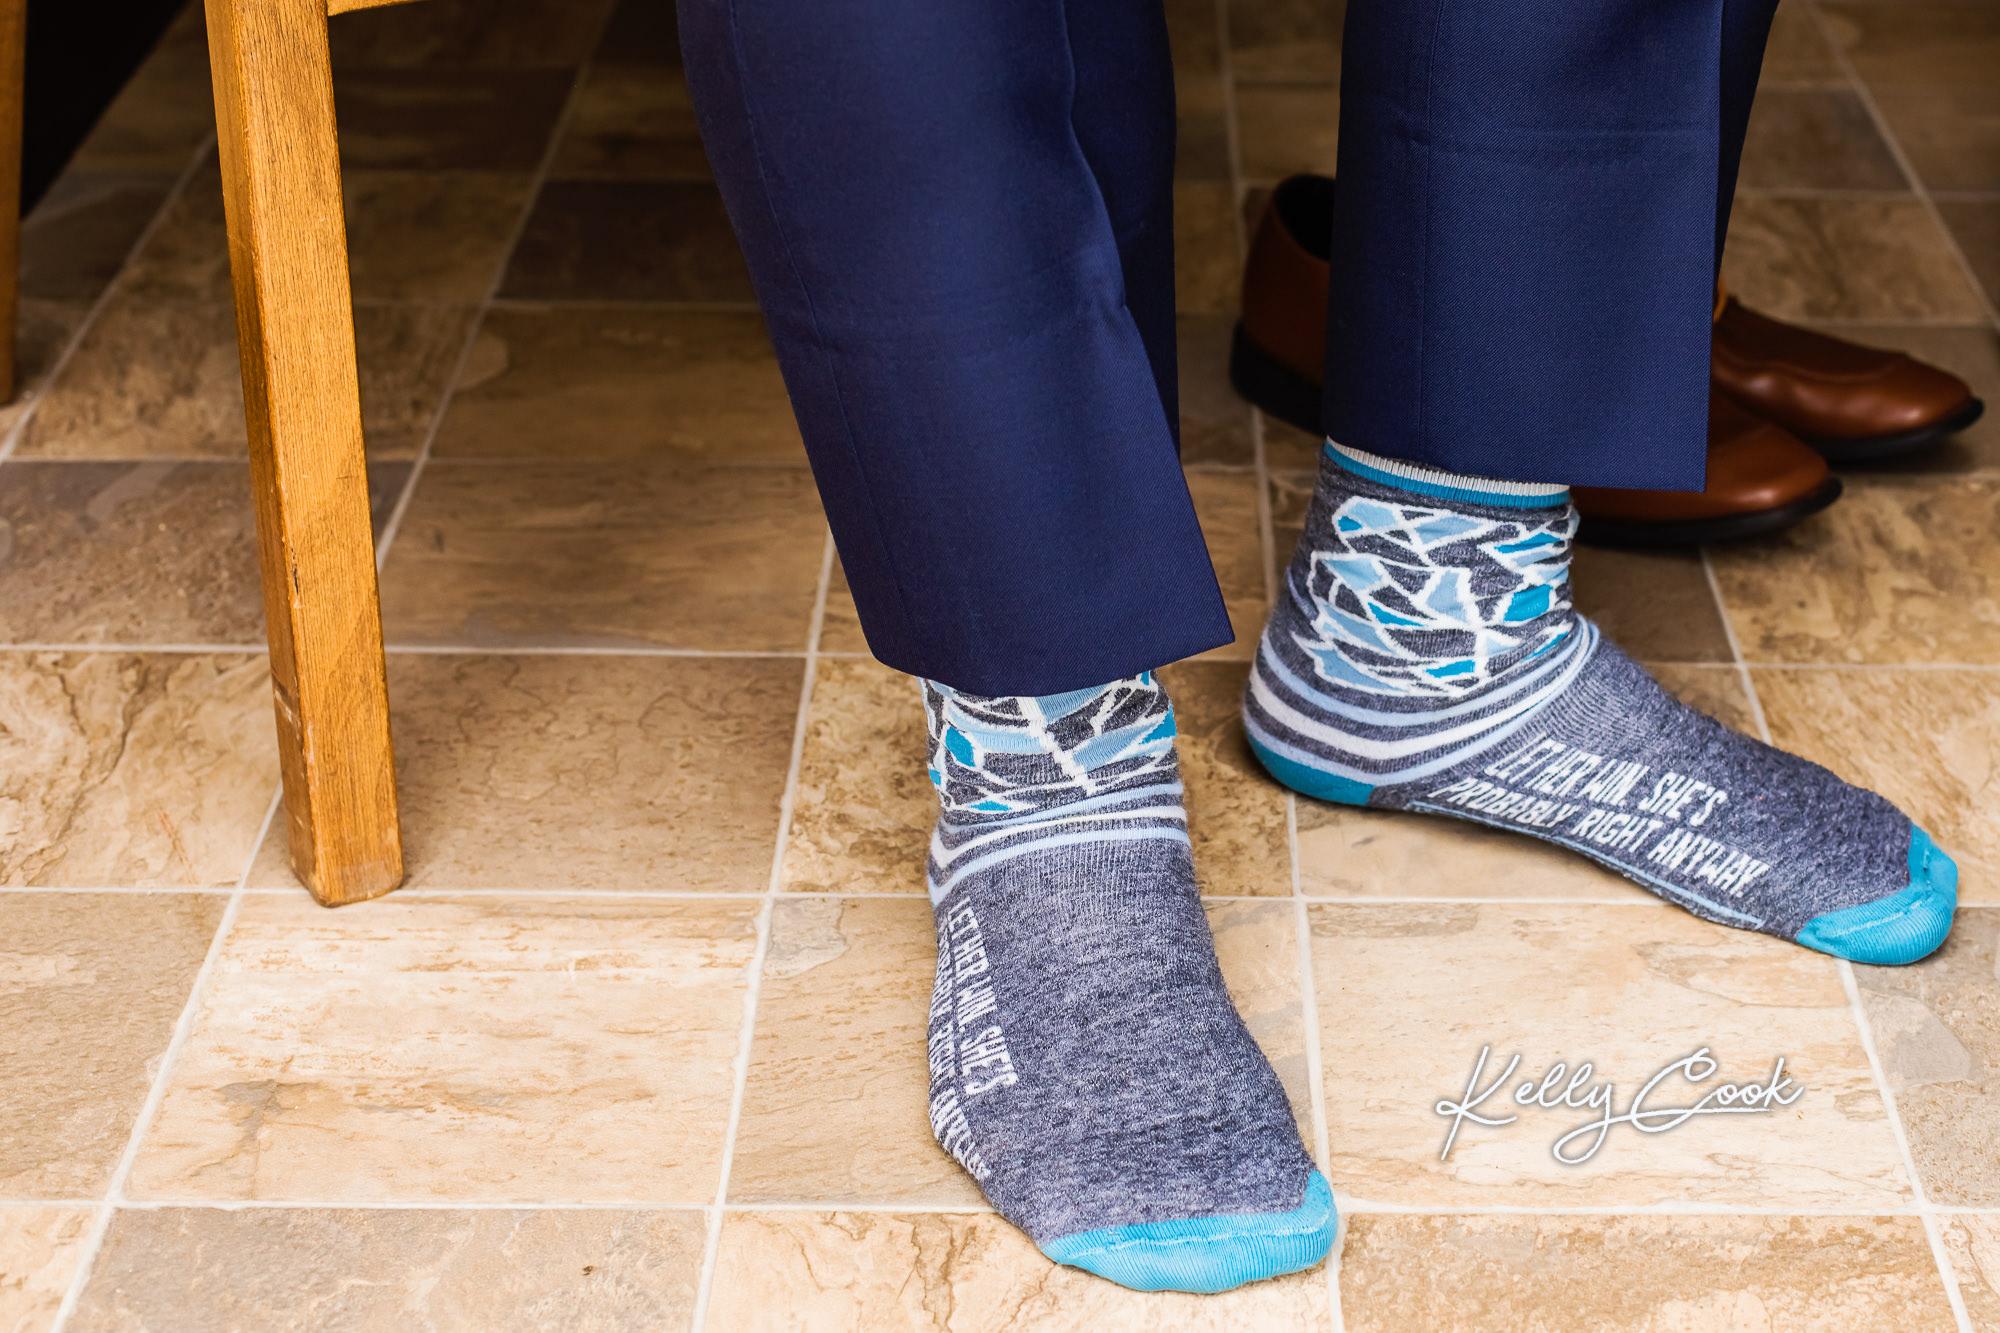 Wedding detail photo of the groom's fun socks